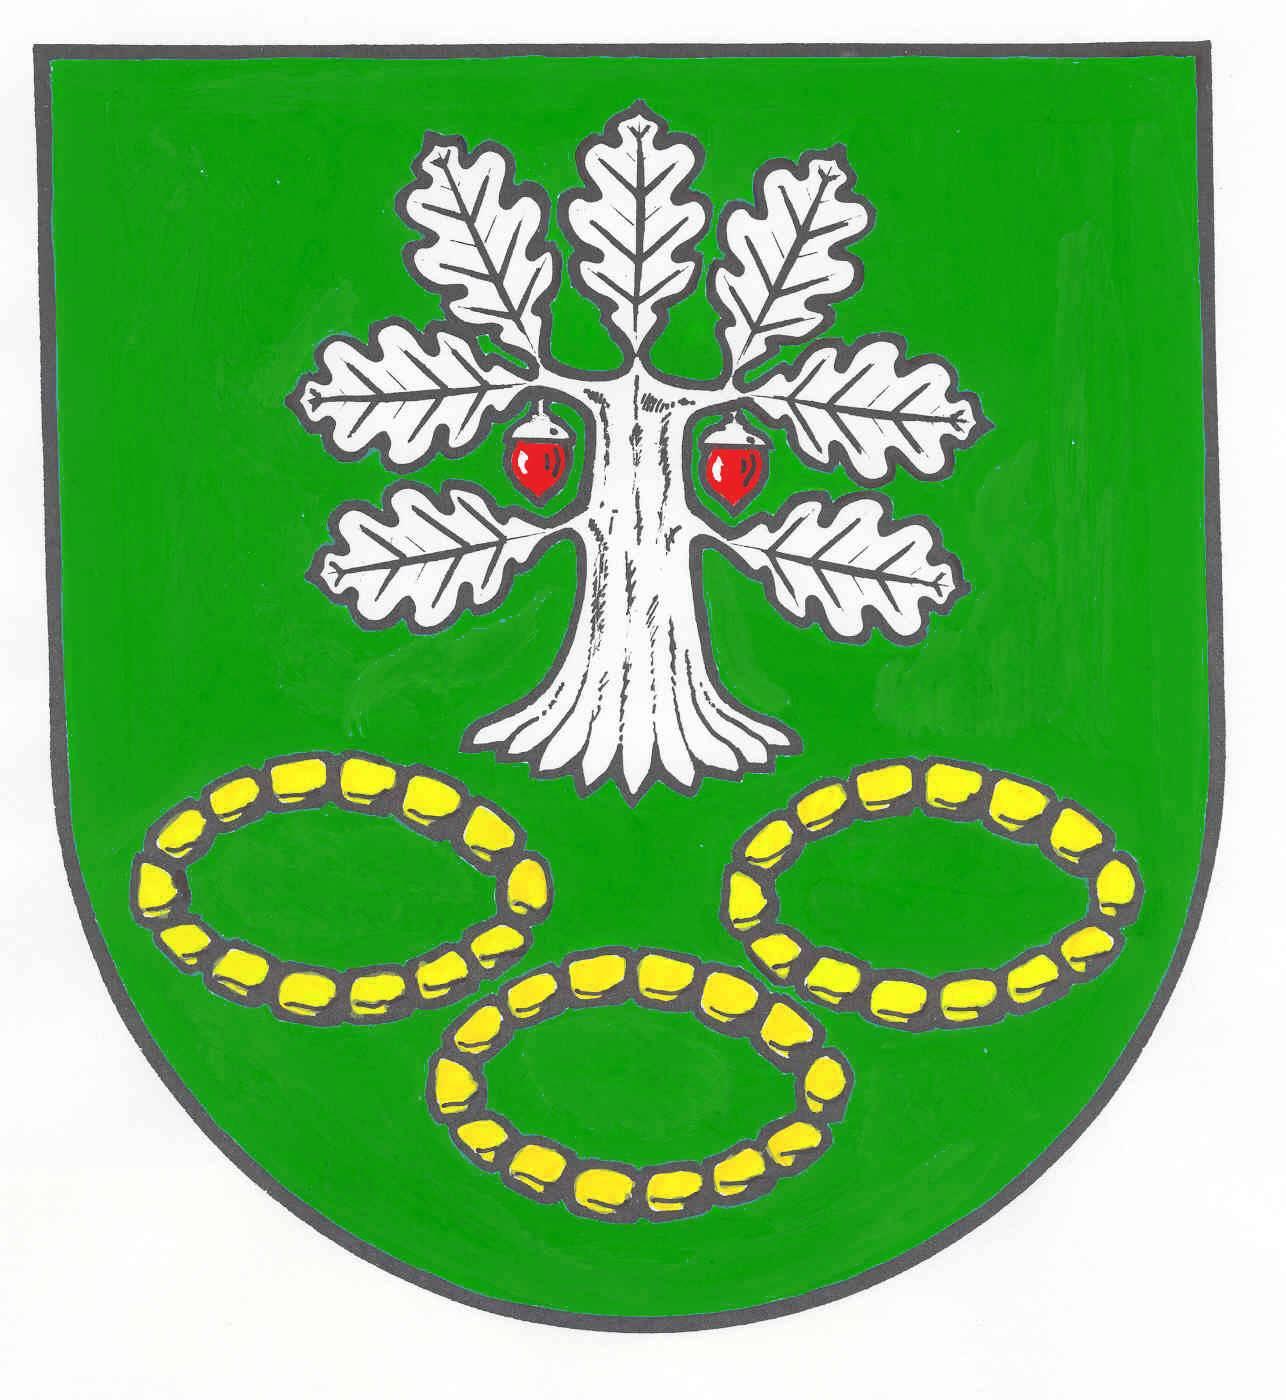 Wappen GemeindeHögsdorf, Kreis Plön